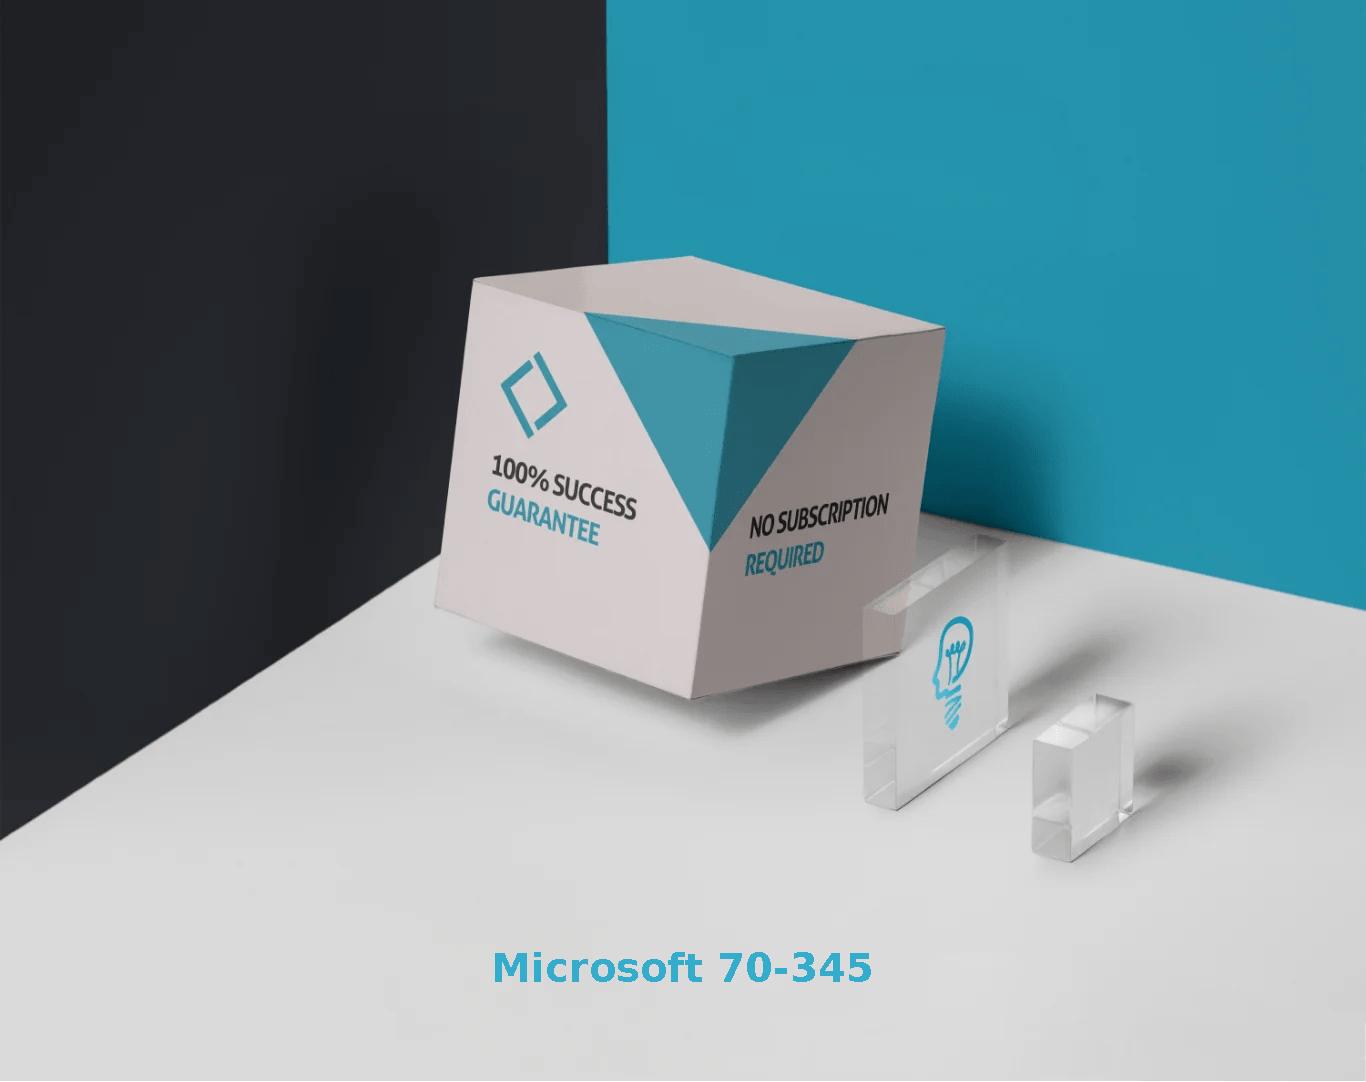 Microsoft 70-345 Exams